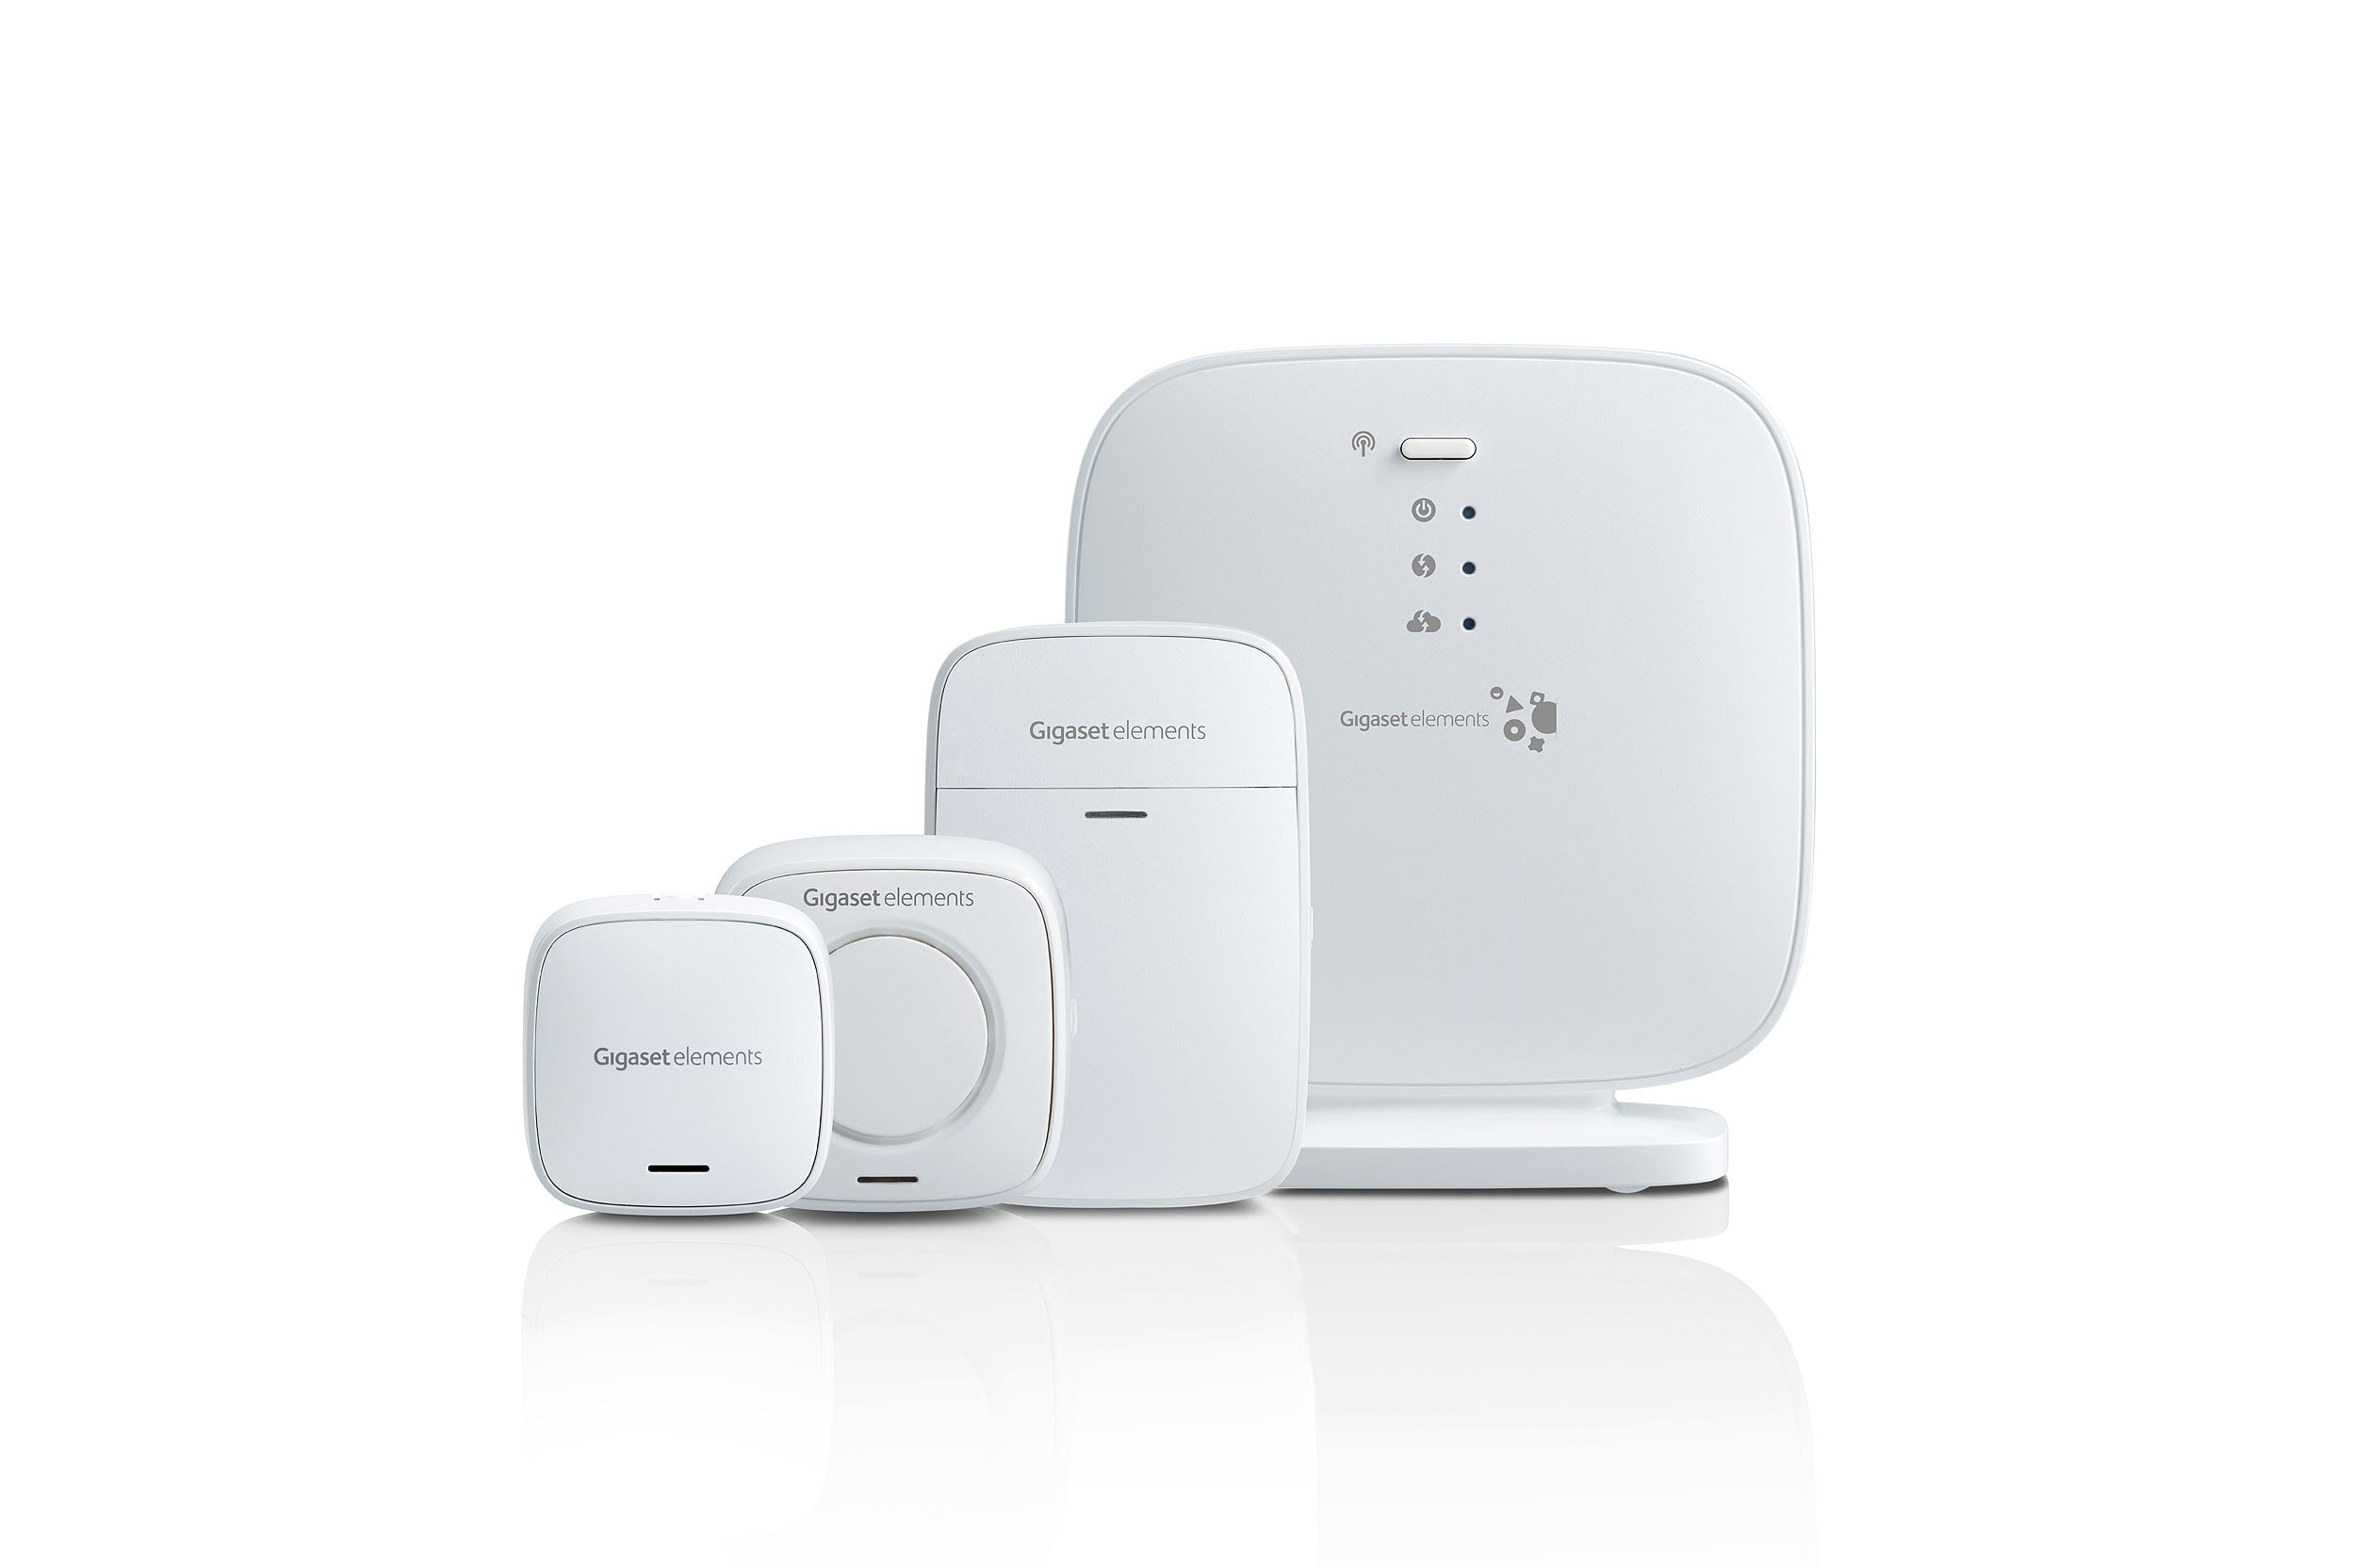 gigaset-elements-sicurezza-smart-01